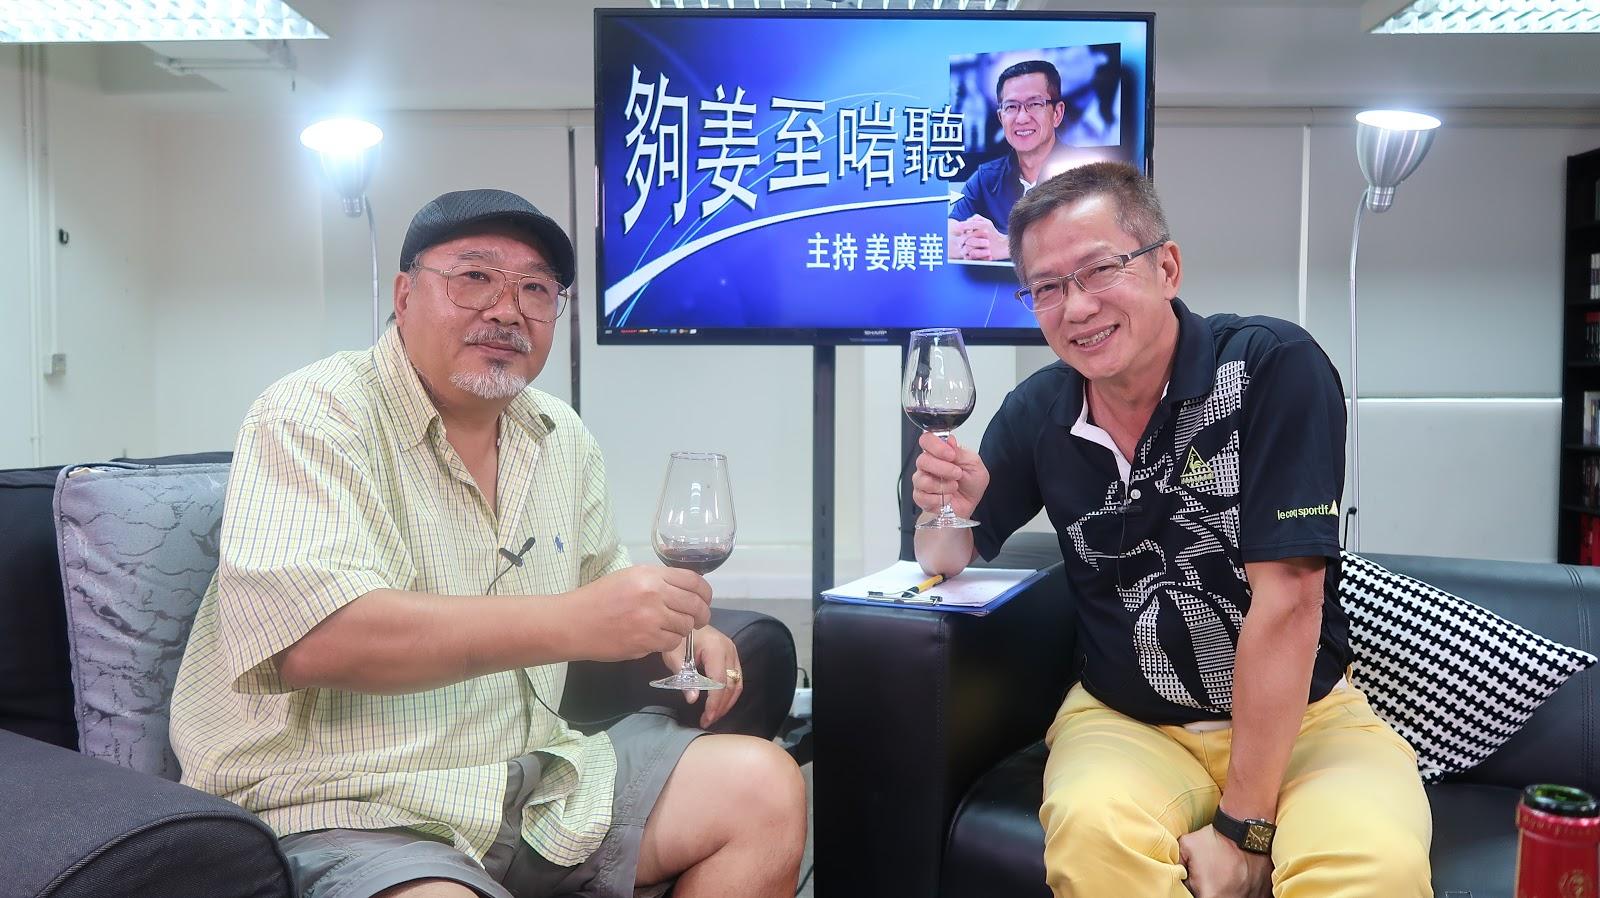 MyRadio.HK 臺務網誌: 夠姜至啱聽 180821 ep2